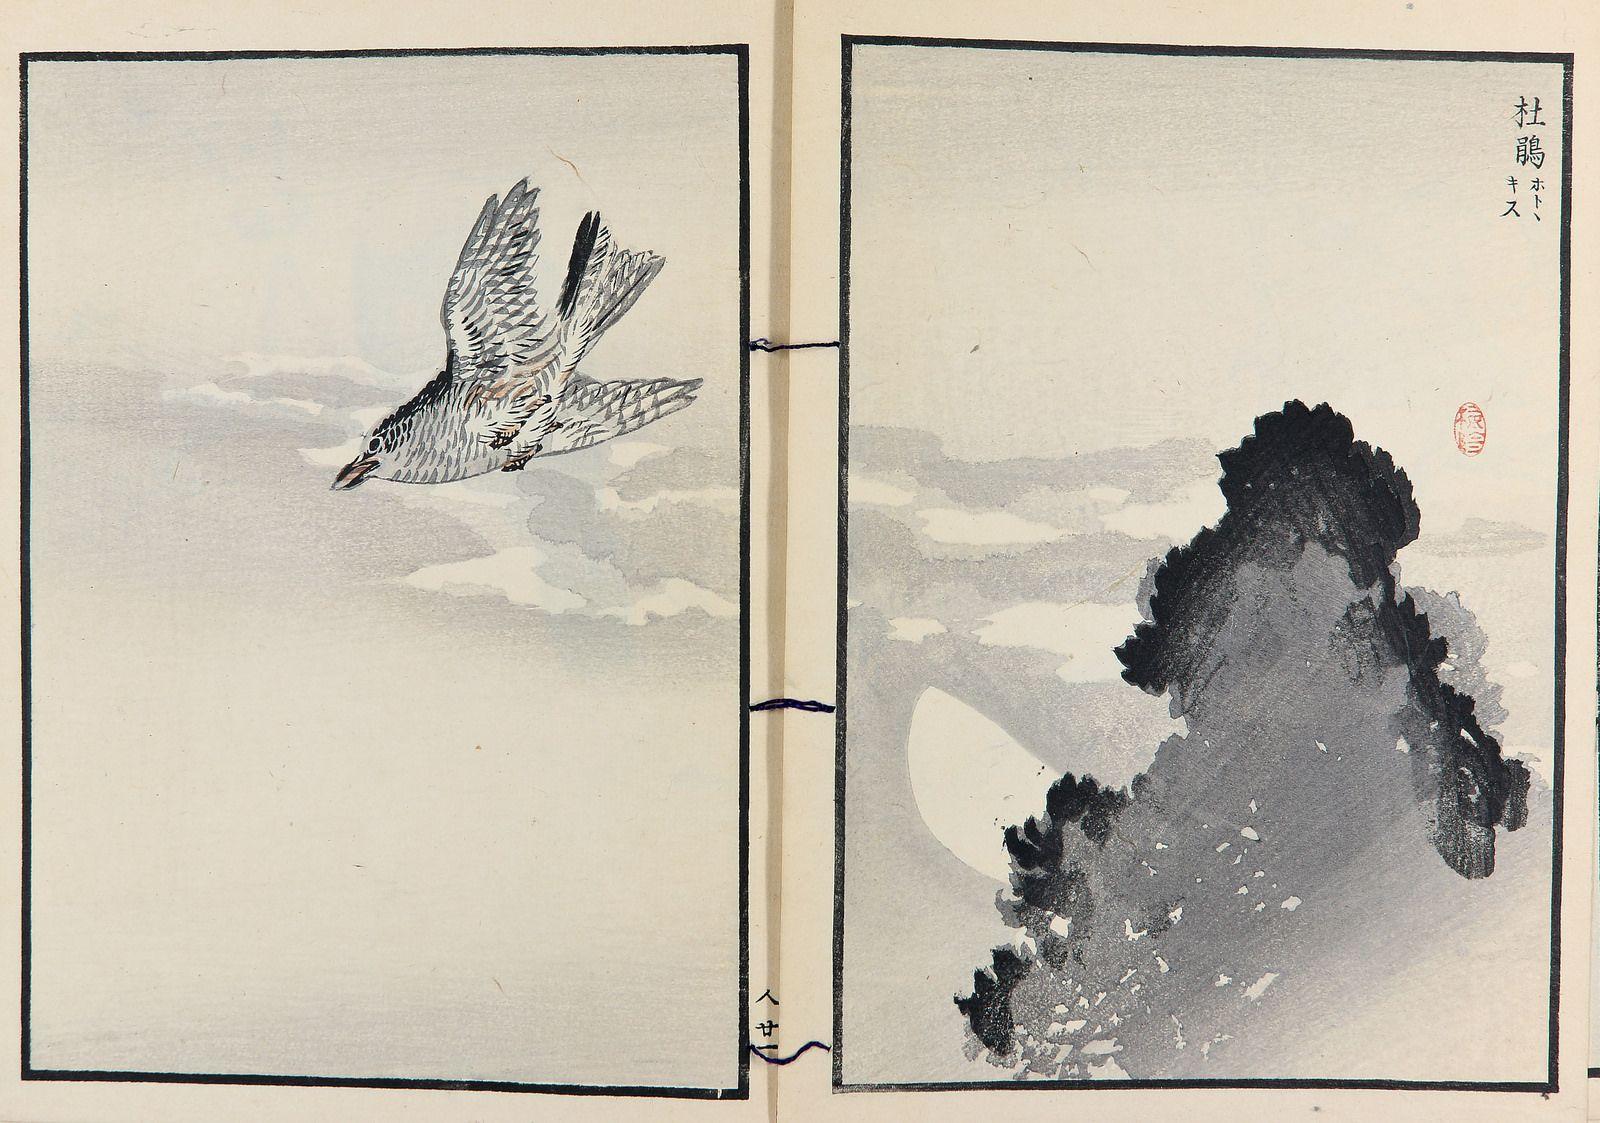 Cent espèces d'oiseaux | Flickr - Photo Sharing! Collection Takashima.